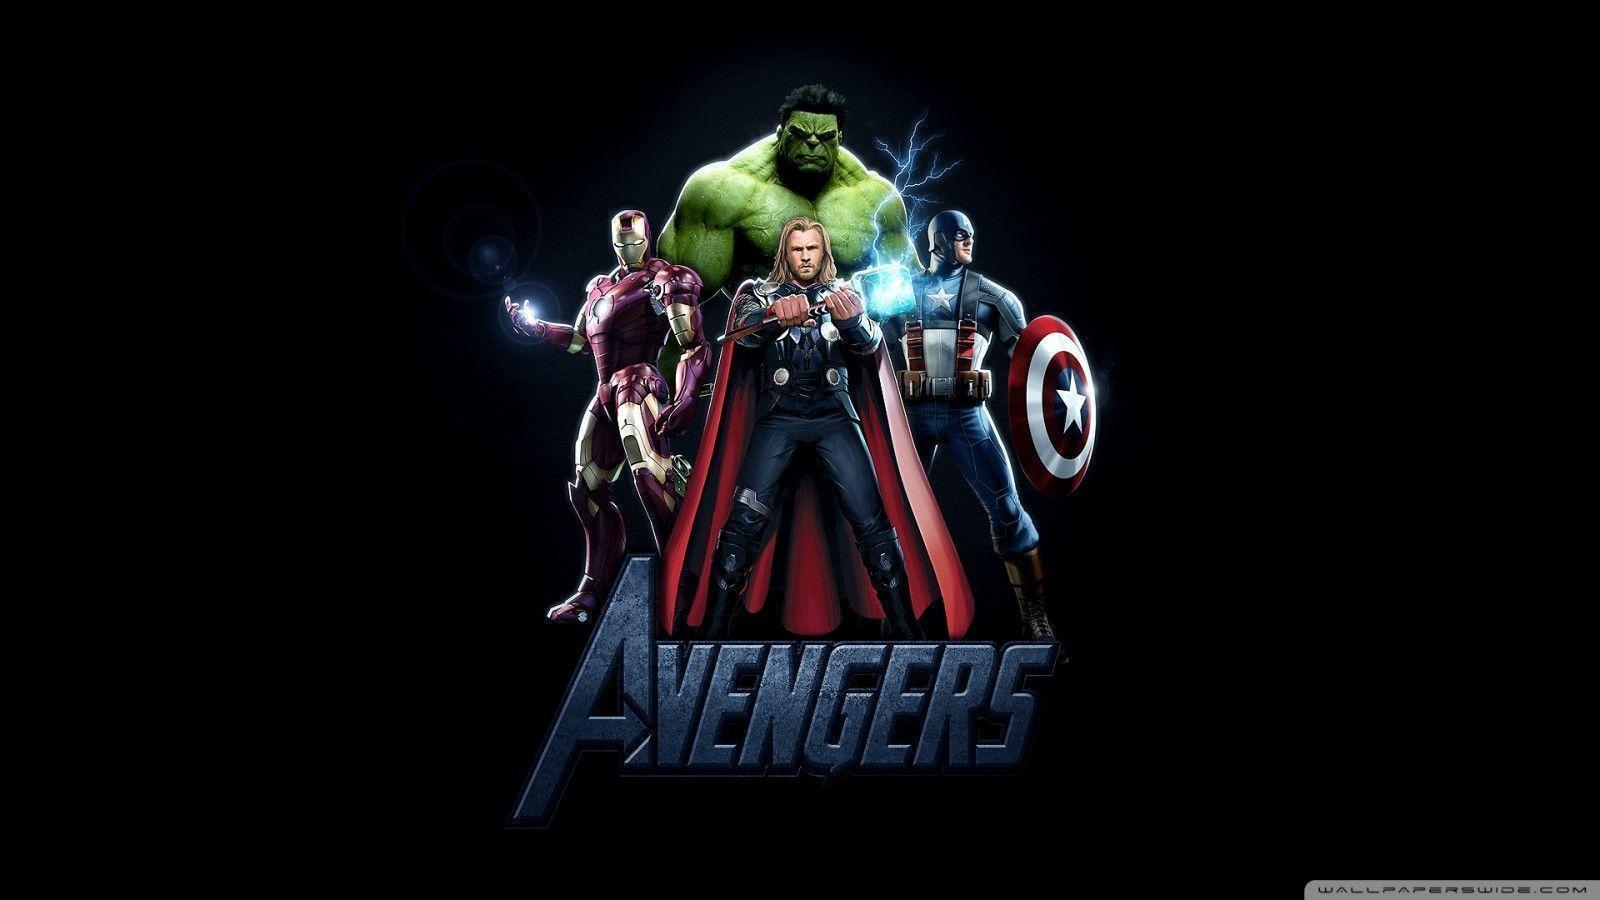 Superheroes logos wallpapers wallpaper cave - All marvel heroes wallpaper ...